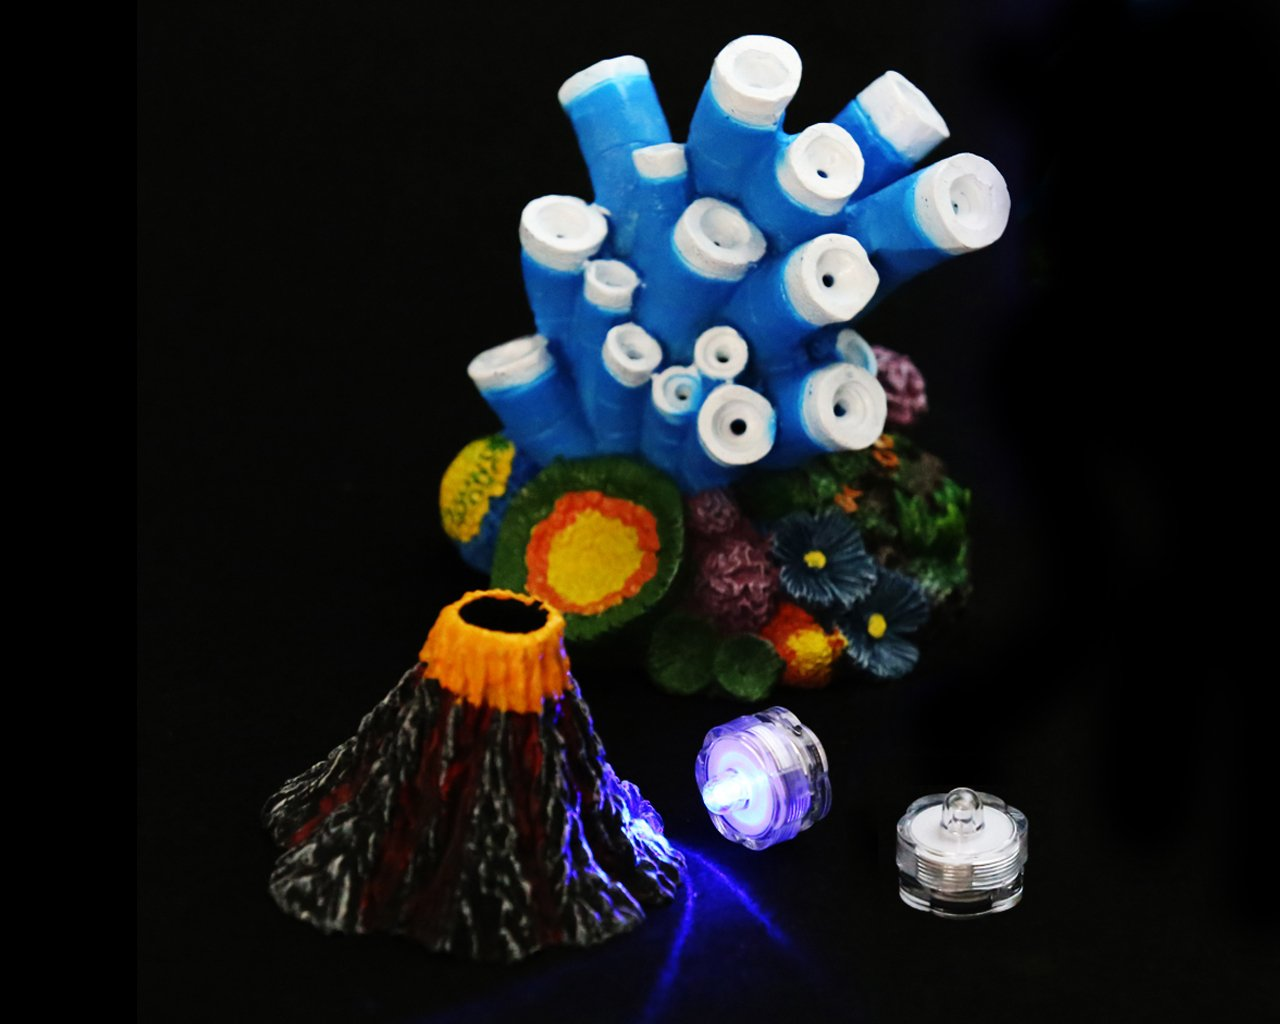 Winterworm Adornos para acuarios con luces de acuario, resina, coral volcánico para decorar peceras: Amazon.es: Productos para mascotas